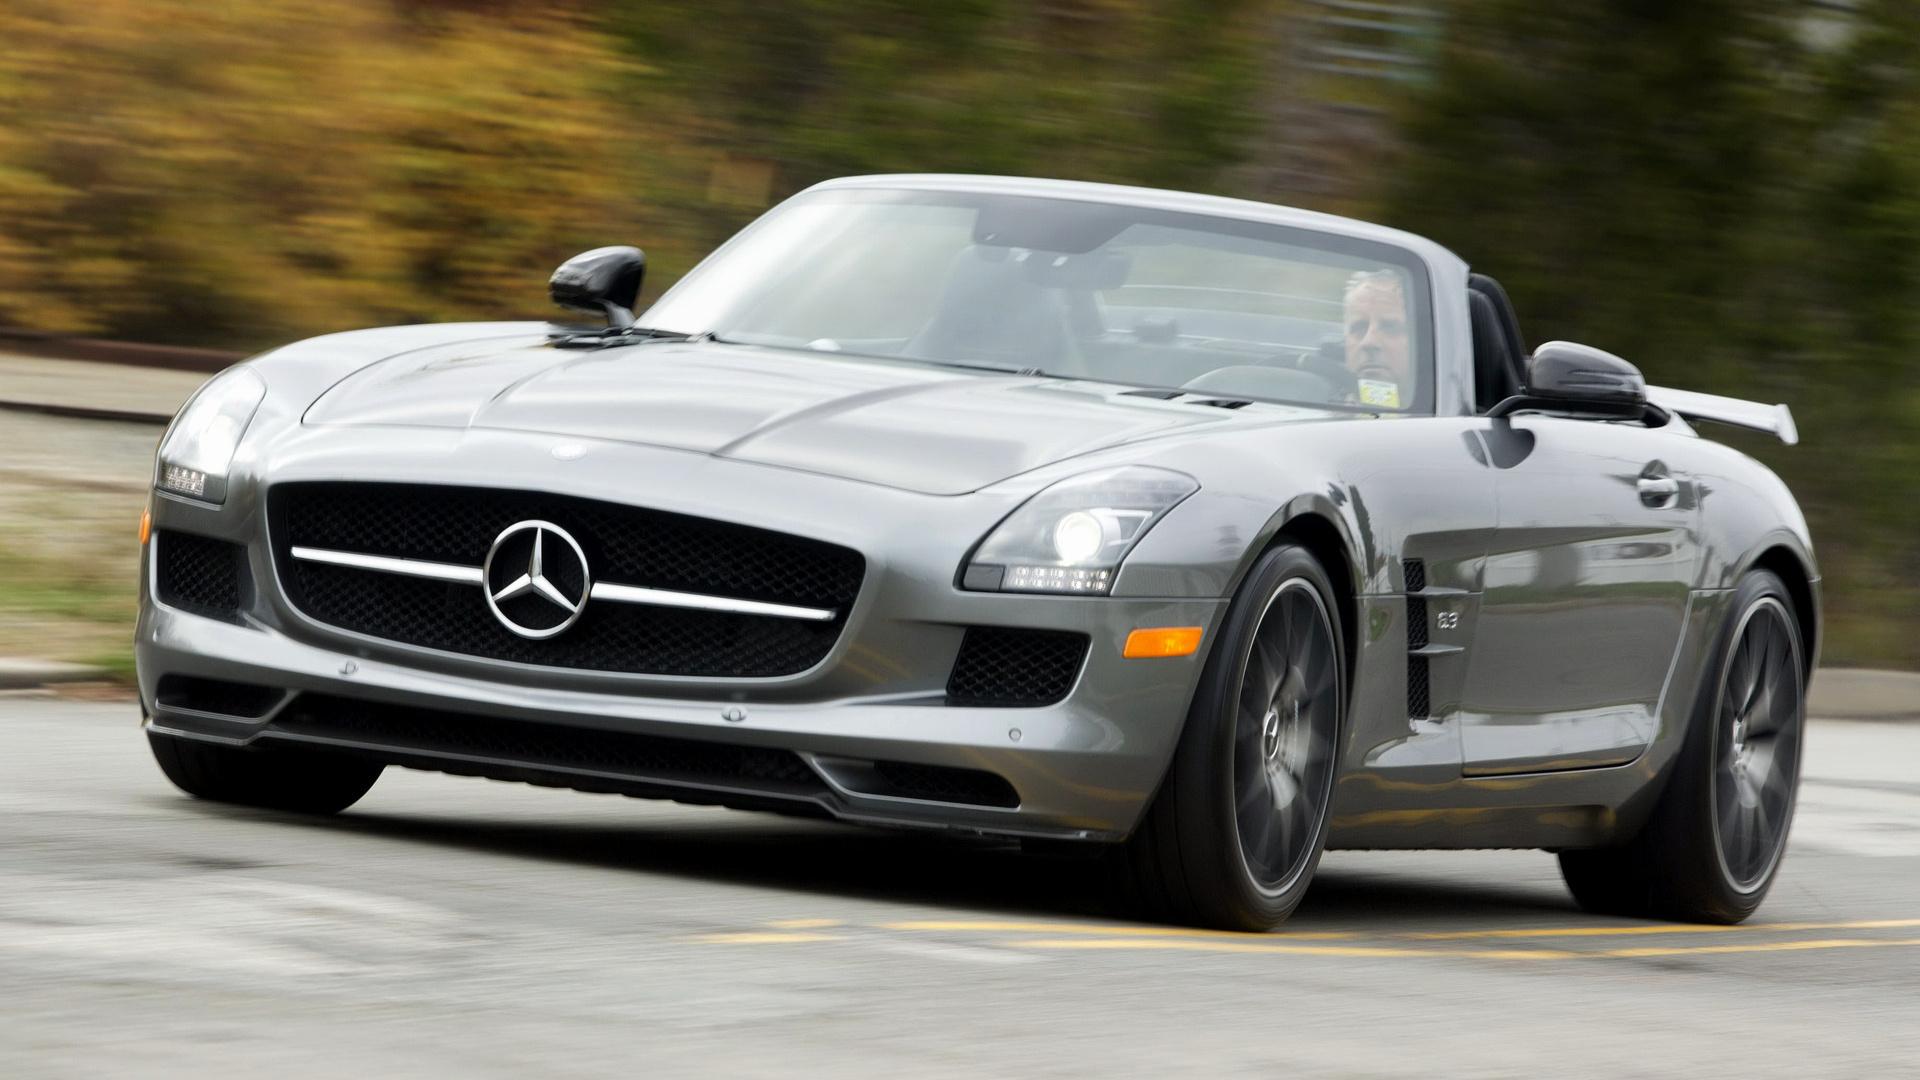 Mercedes Benz Sls Amg Gt Roadster Final Edition 2014 Us Wallpapers